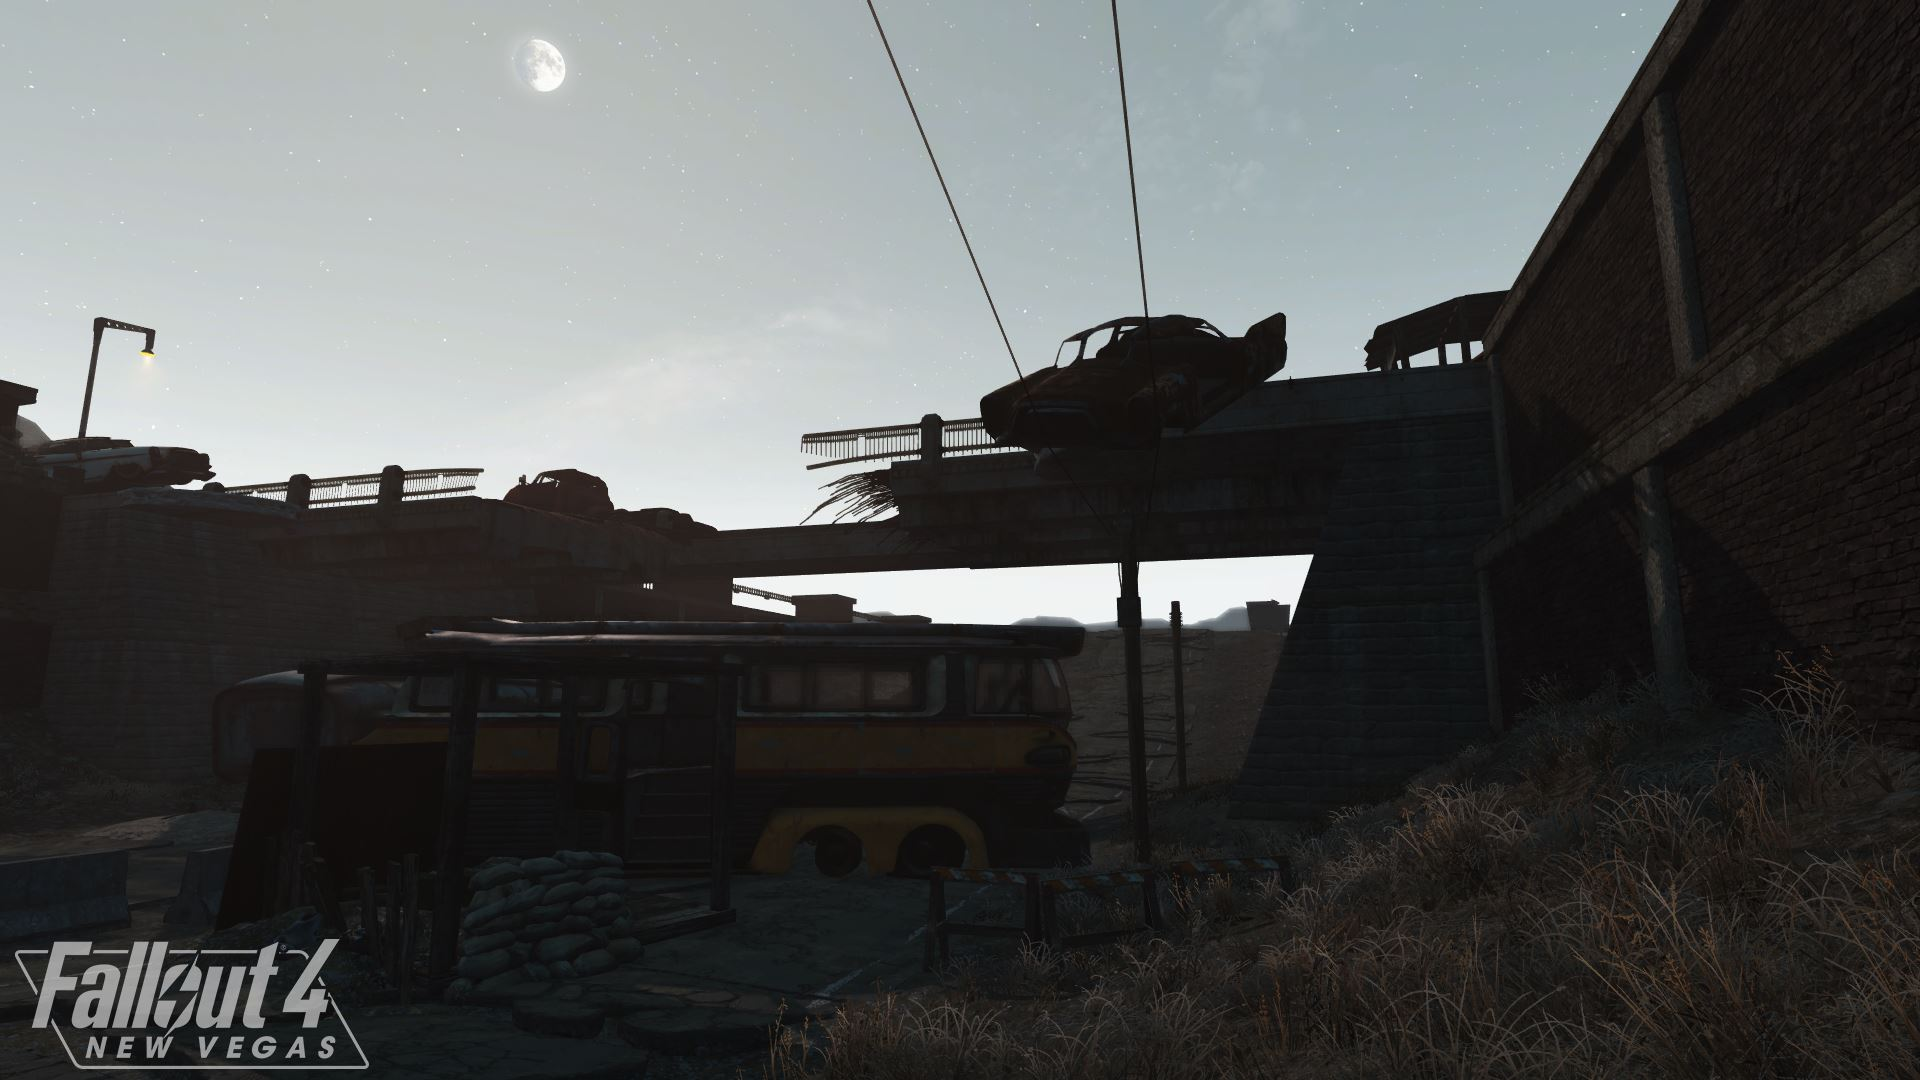 96633906.jpg - Fallout 4